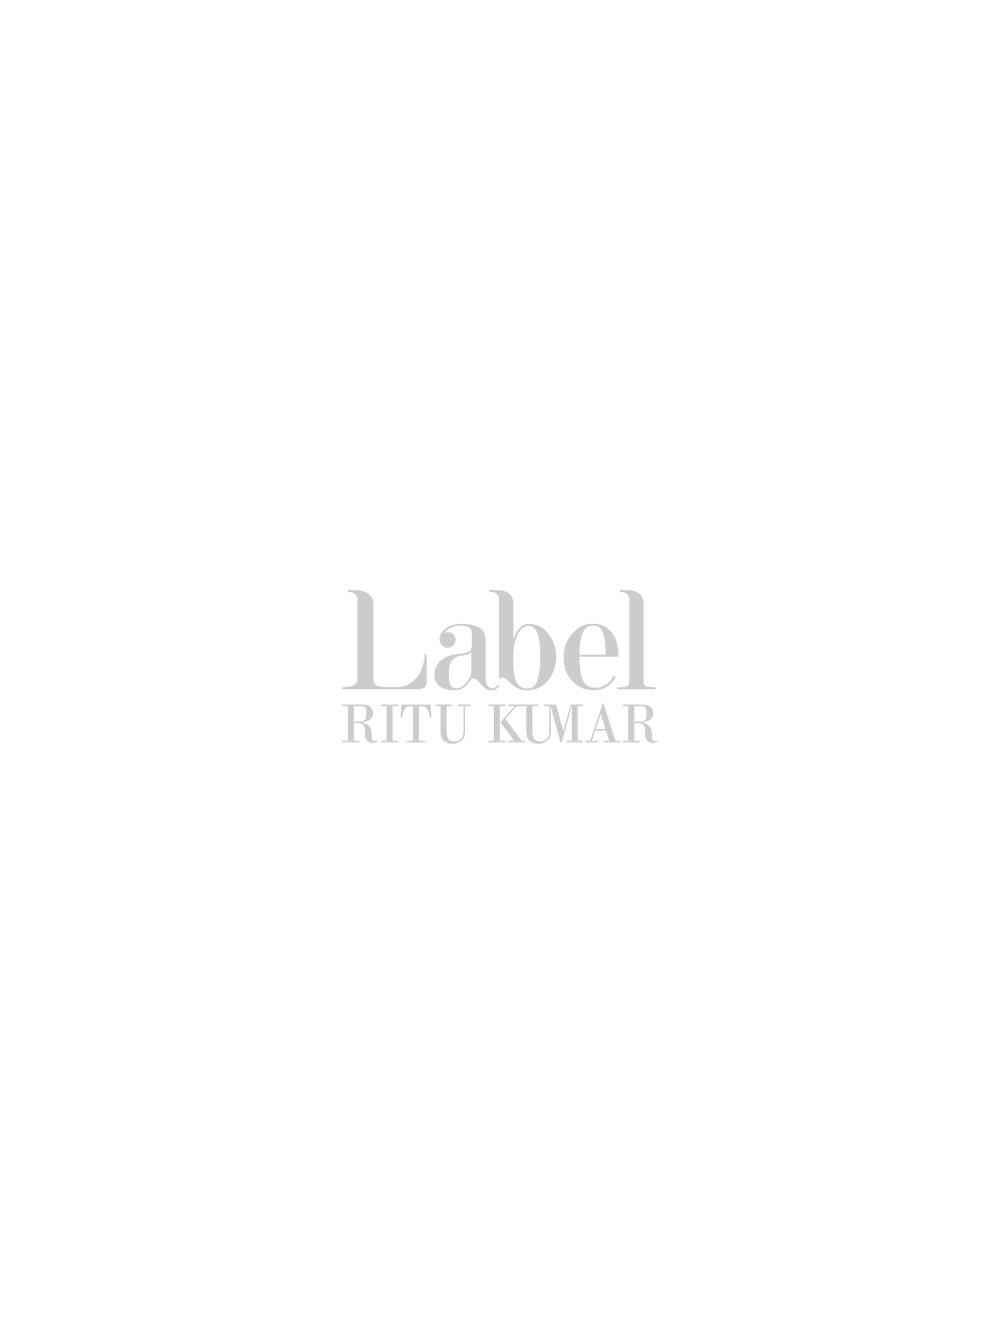 Designer Pleated Dress in Black & Peach Floral Print